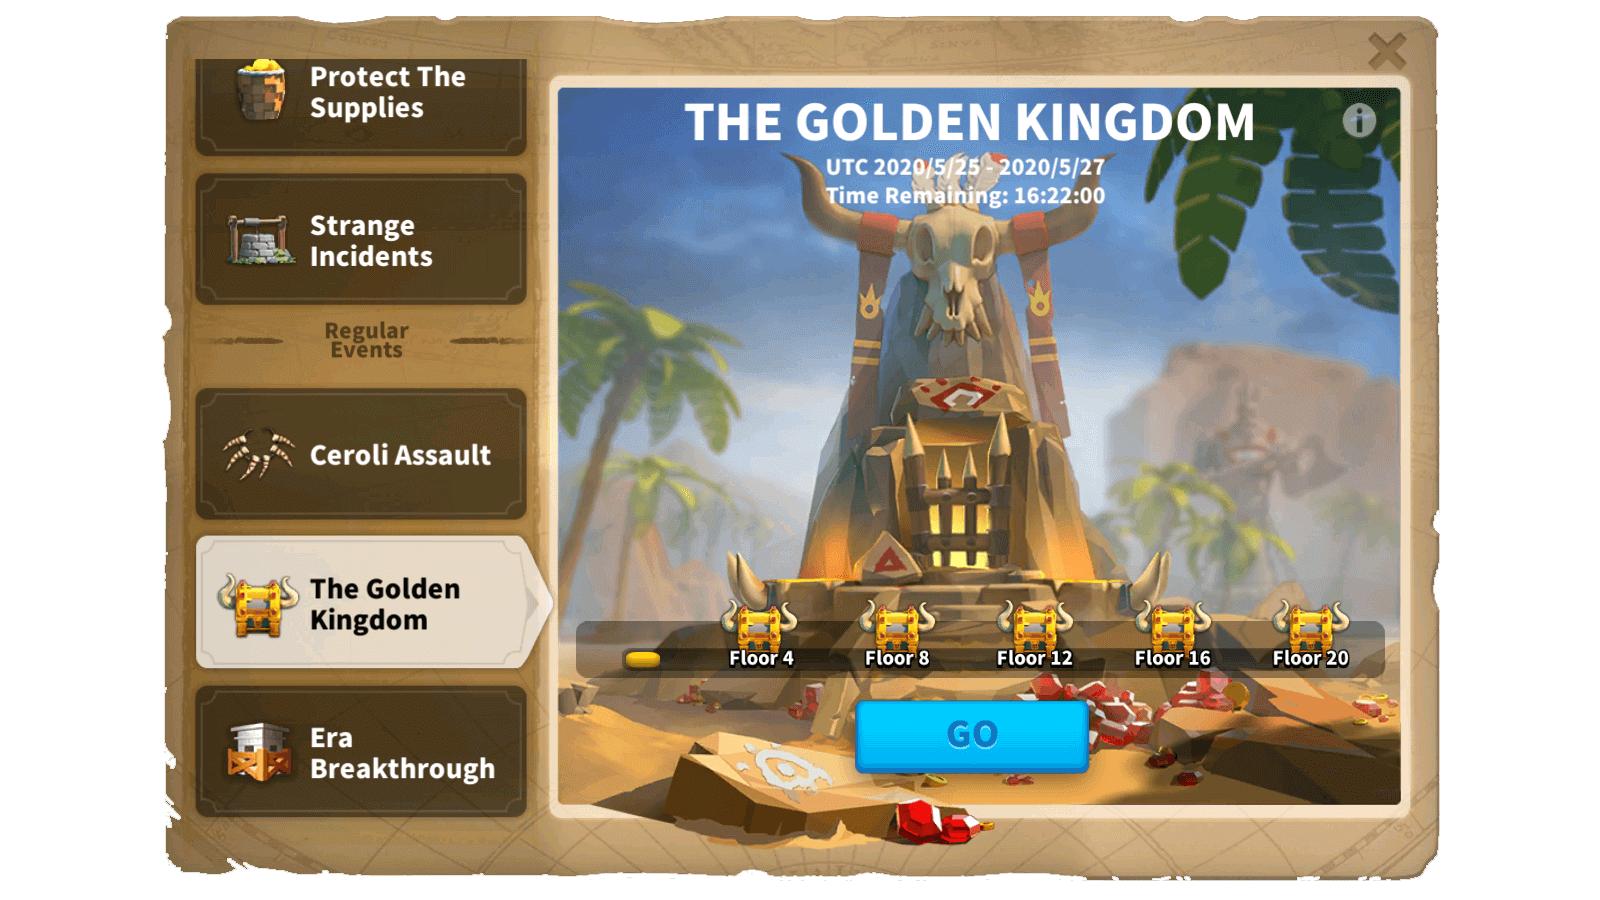 The Golden Kingdom Event